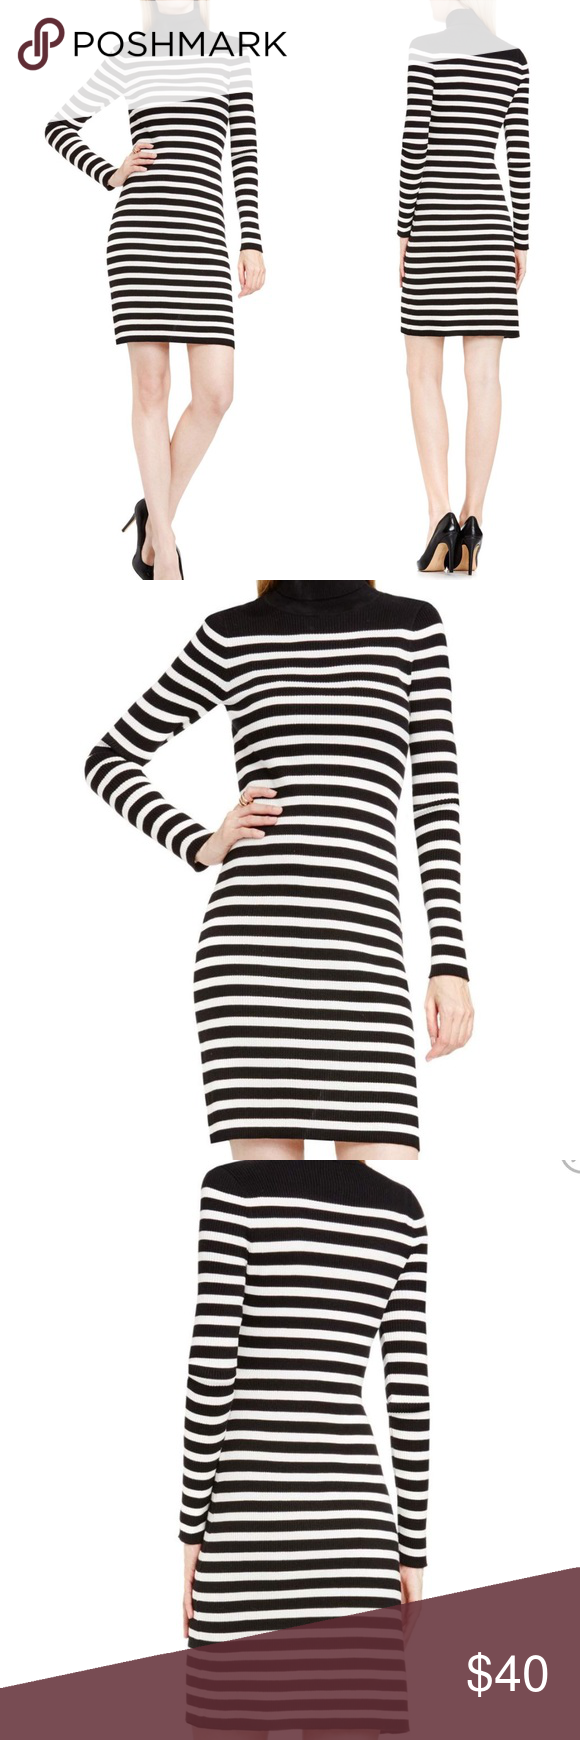 Vince camuto striped turtleneck dress black white nwt pinterest